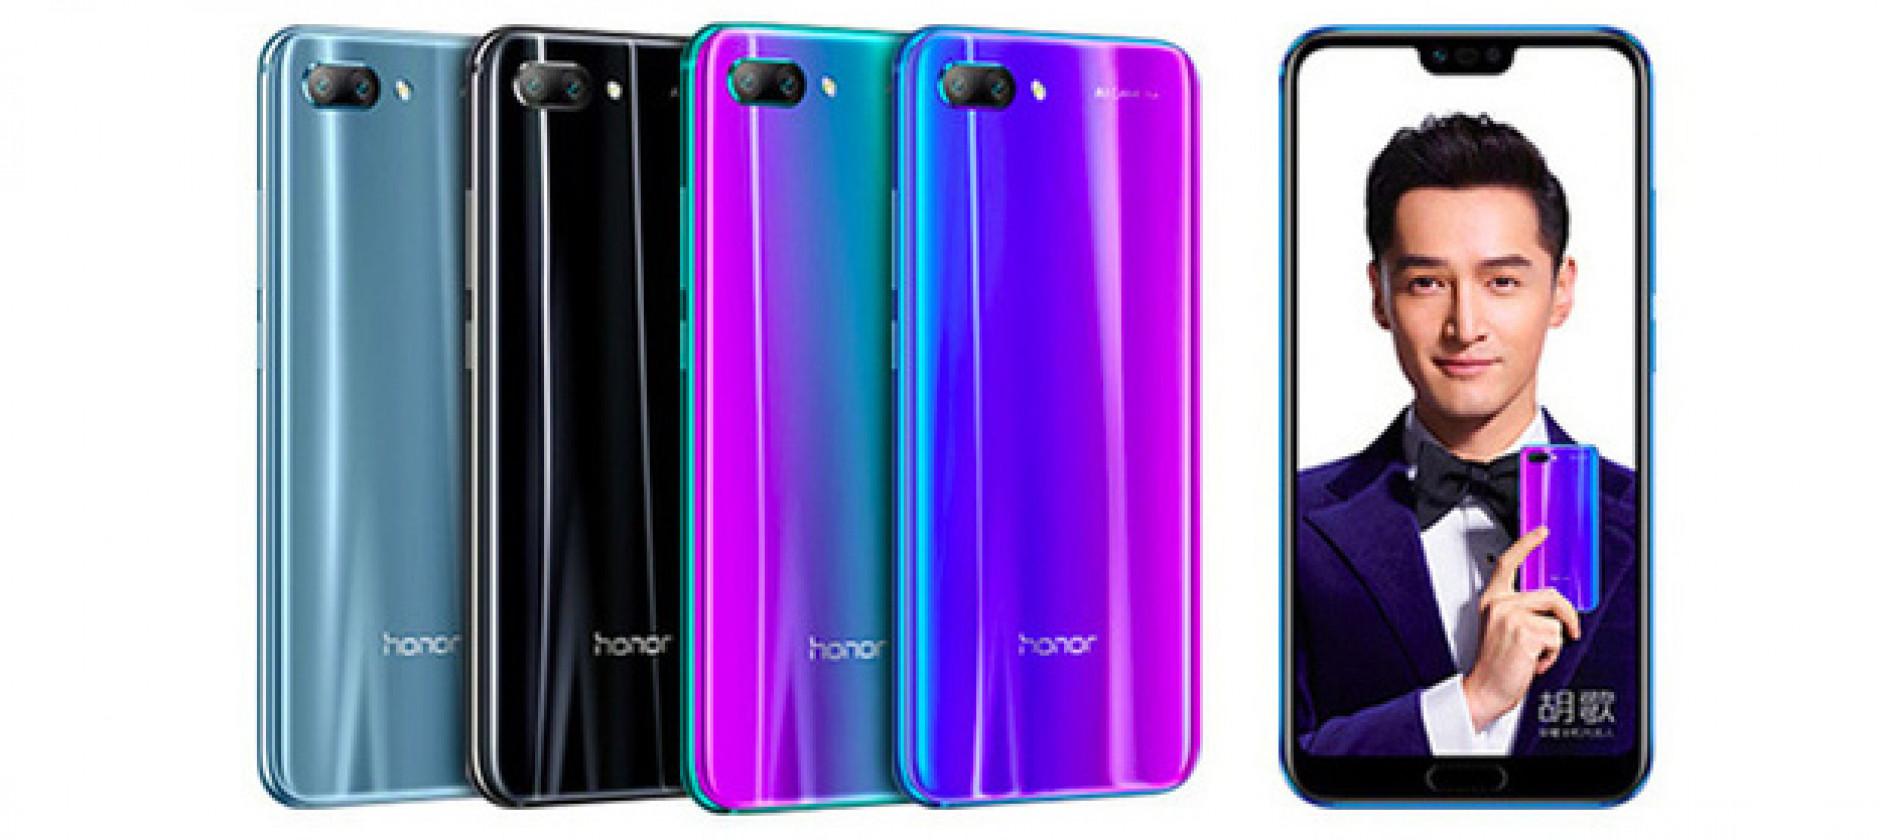 Huawei Honor MediaWorld